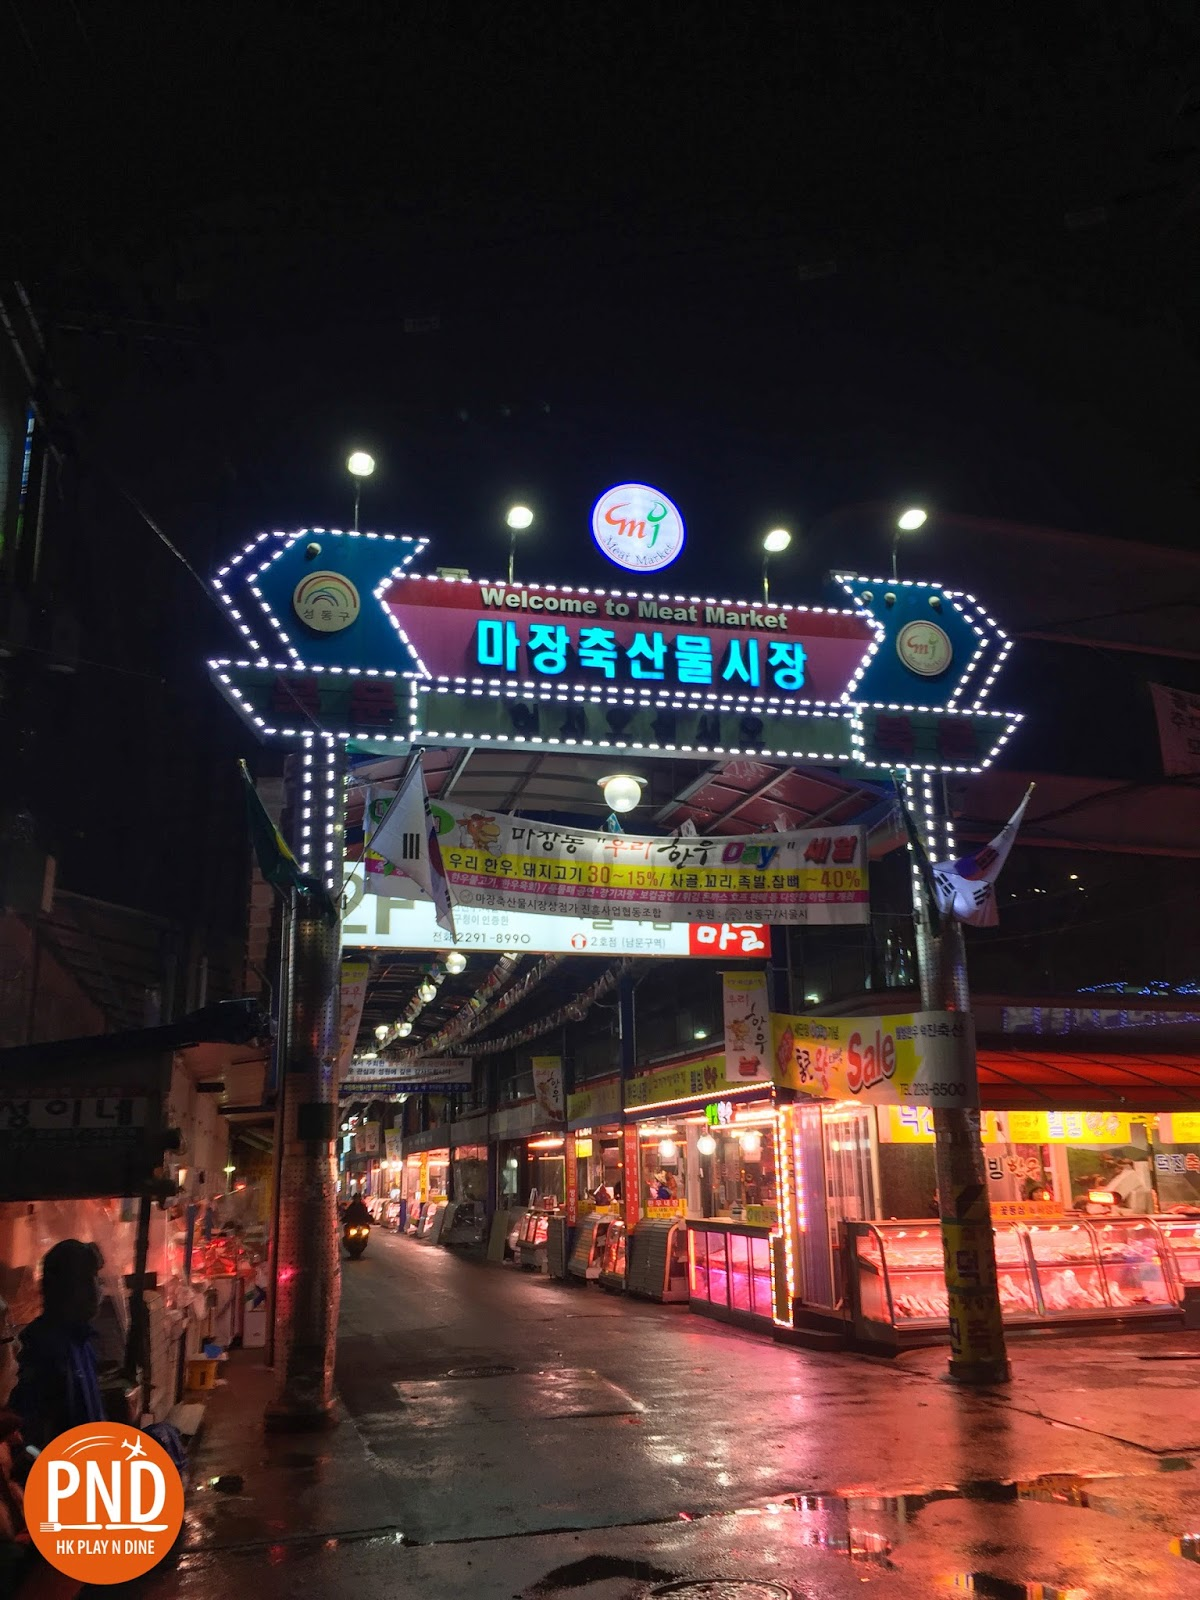 PND純粹分享,愛玩愛食。: 首爾馬場洞 - 燒韓牛盛宴